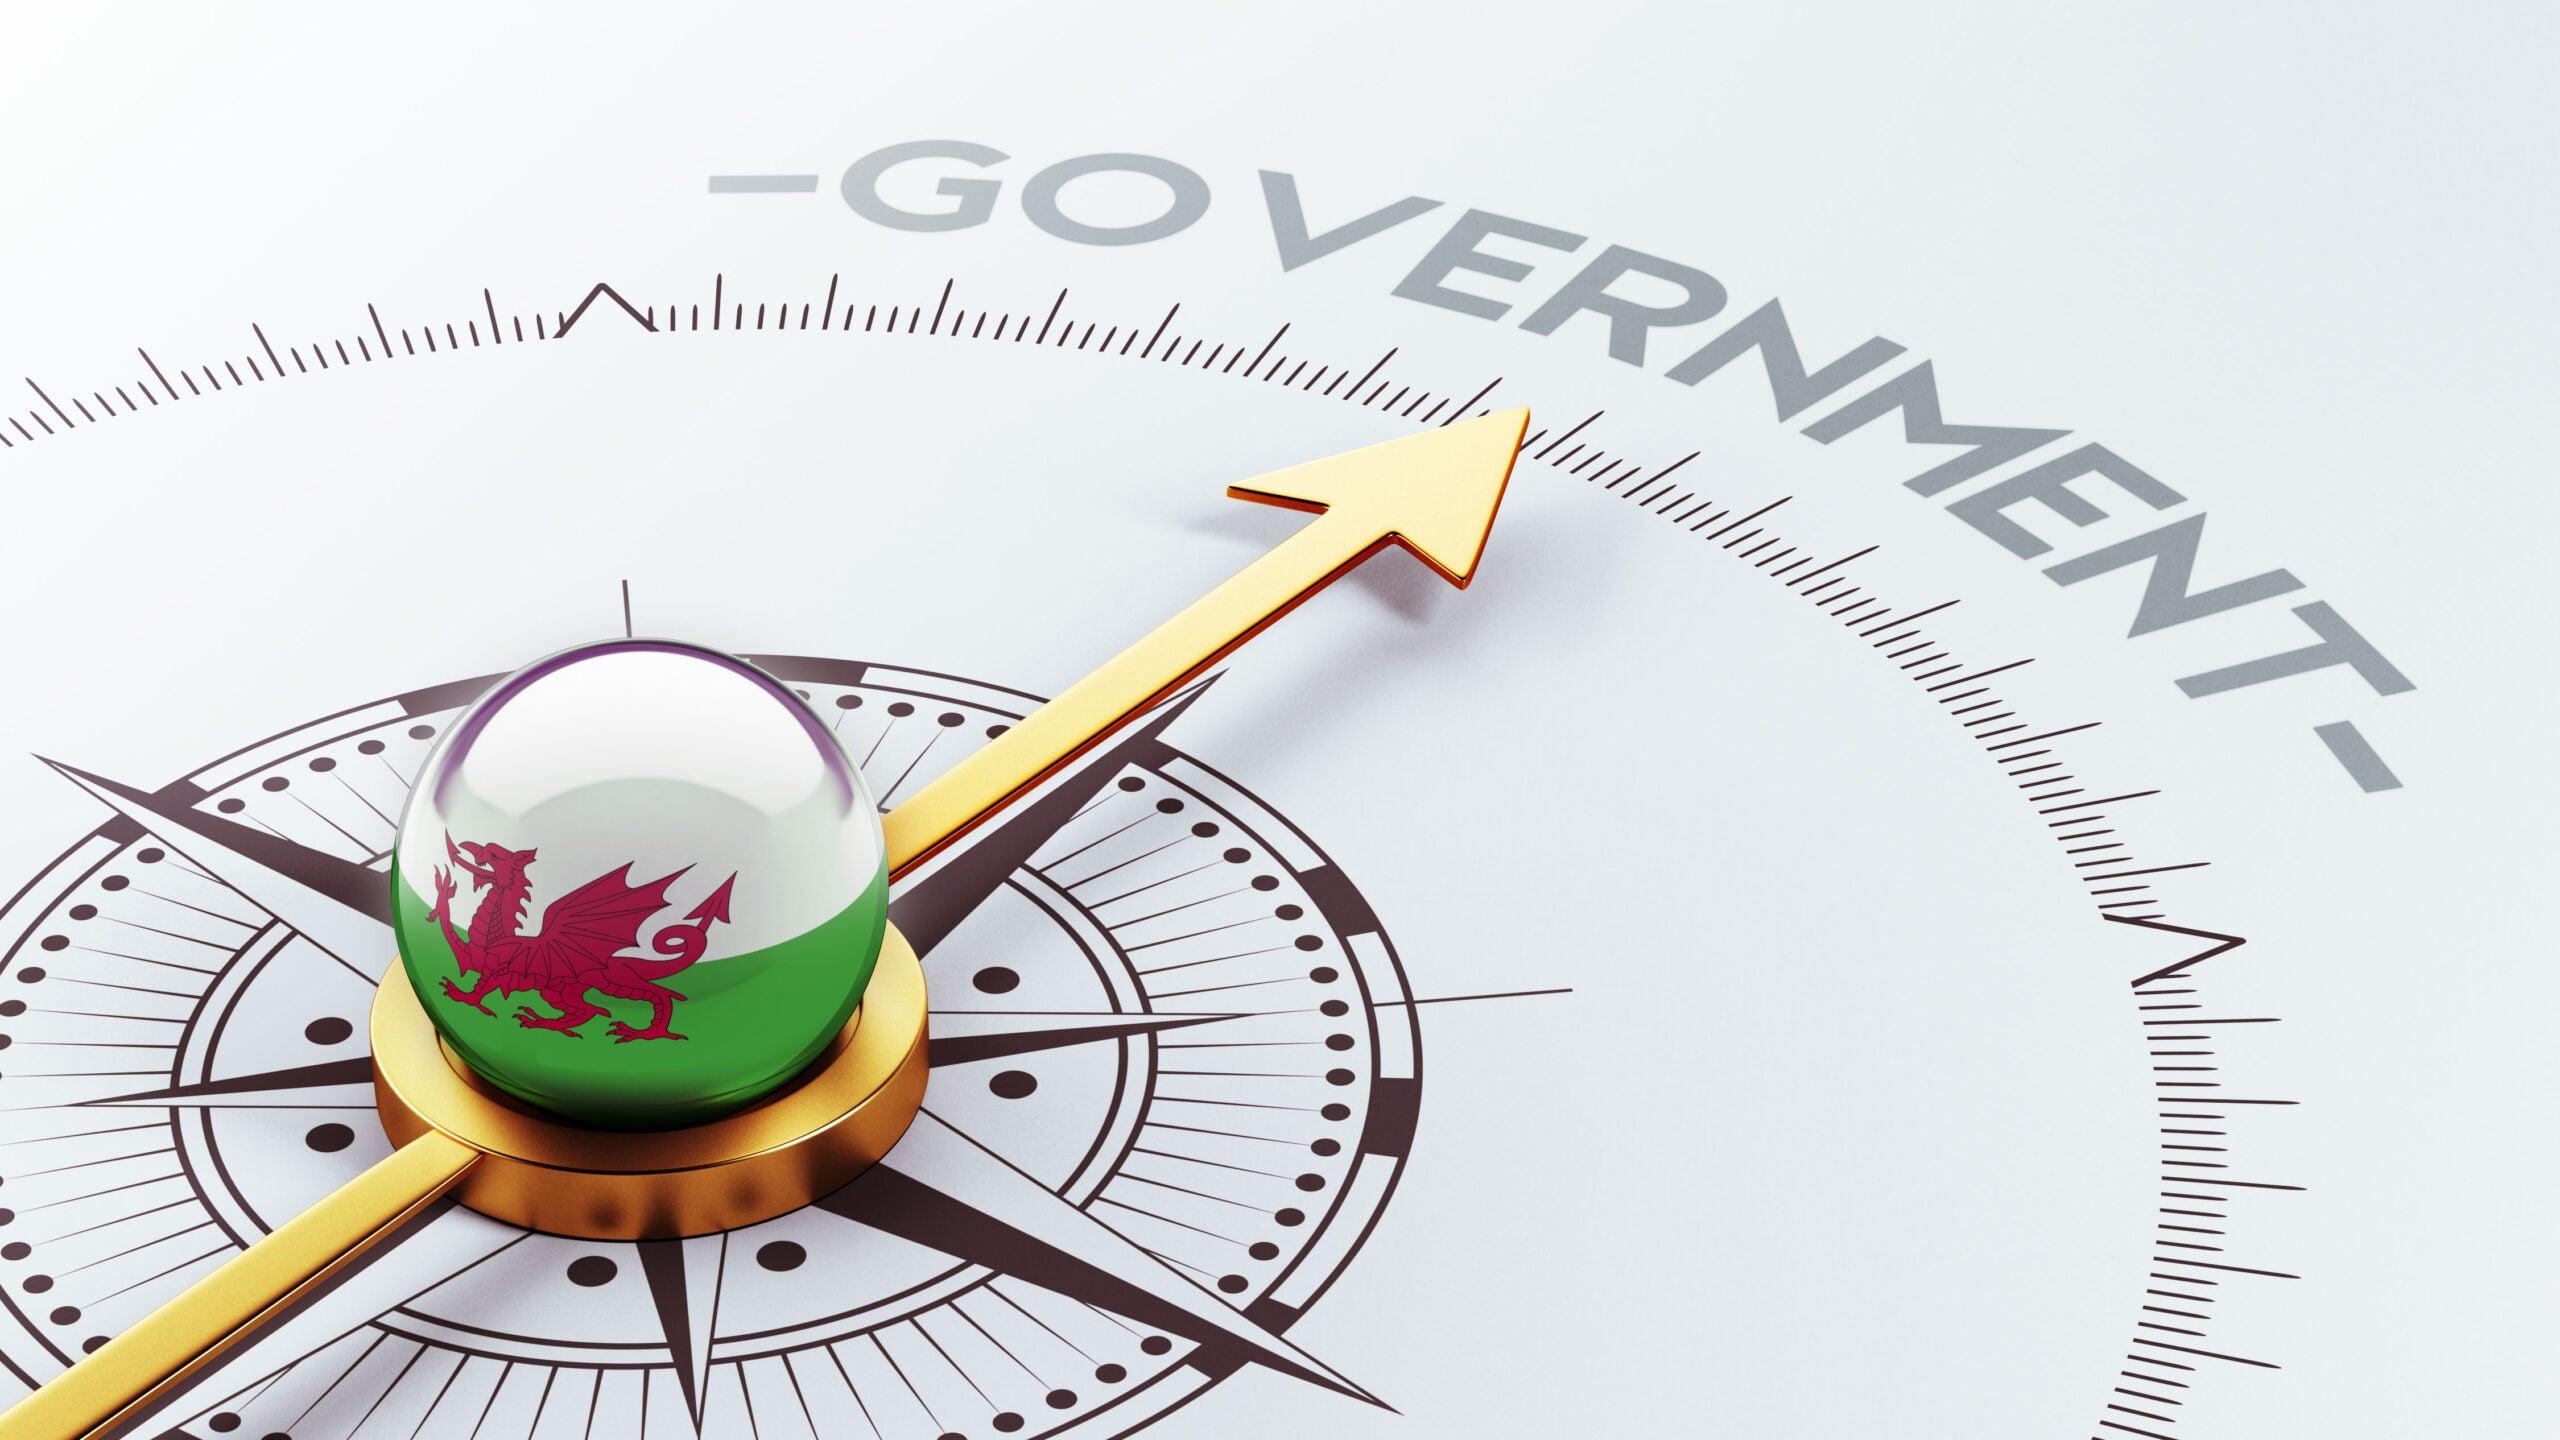 The dilemma facing Plaid Cymru